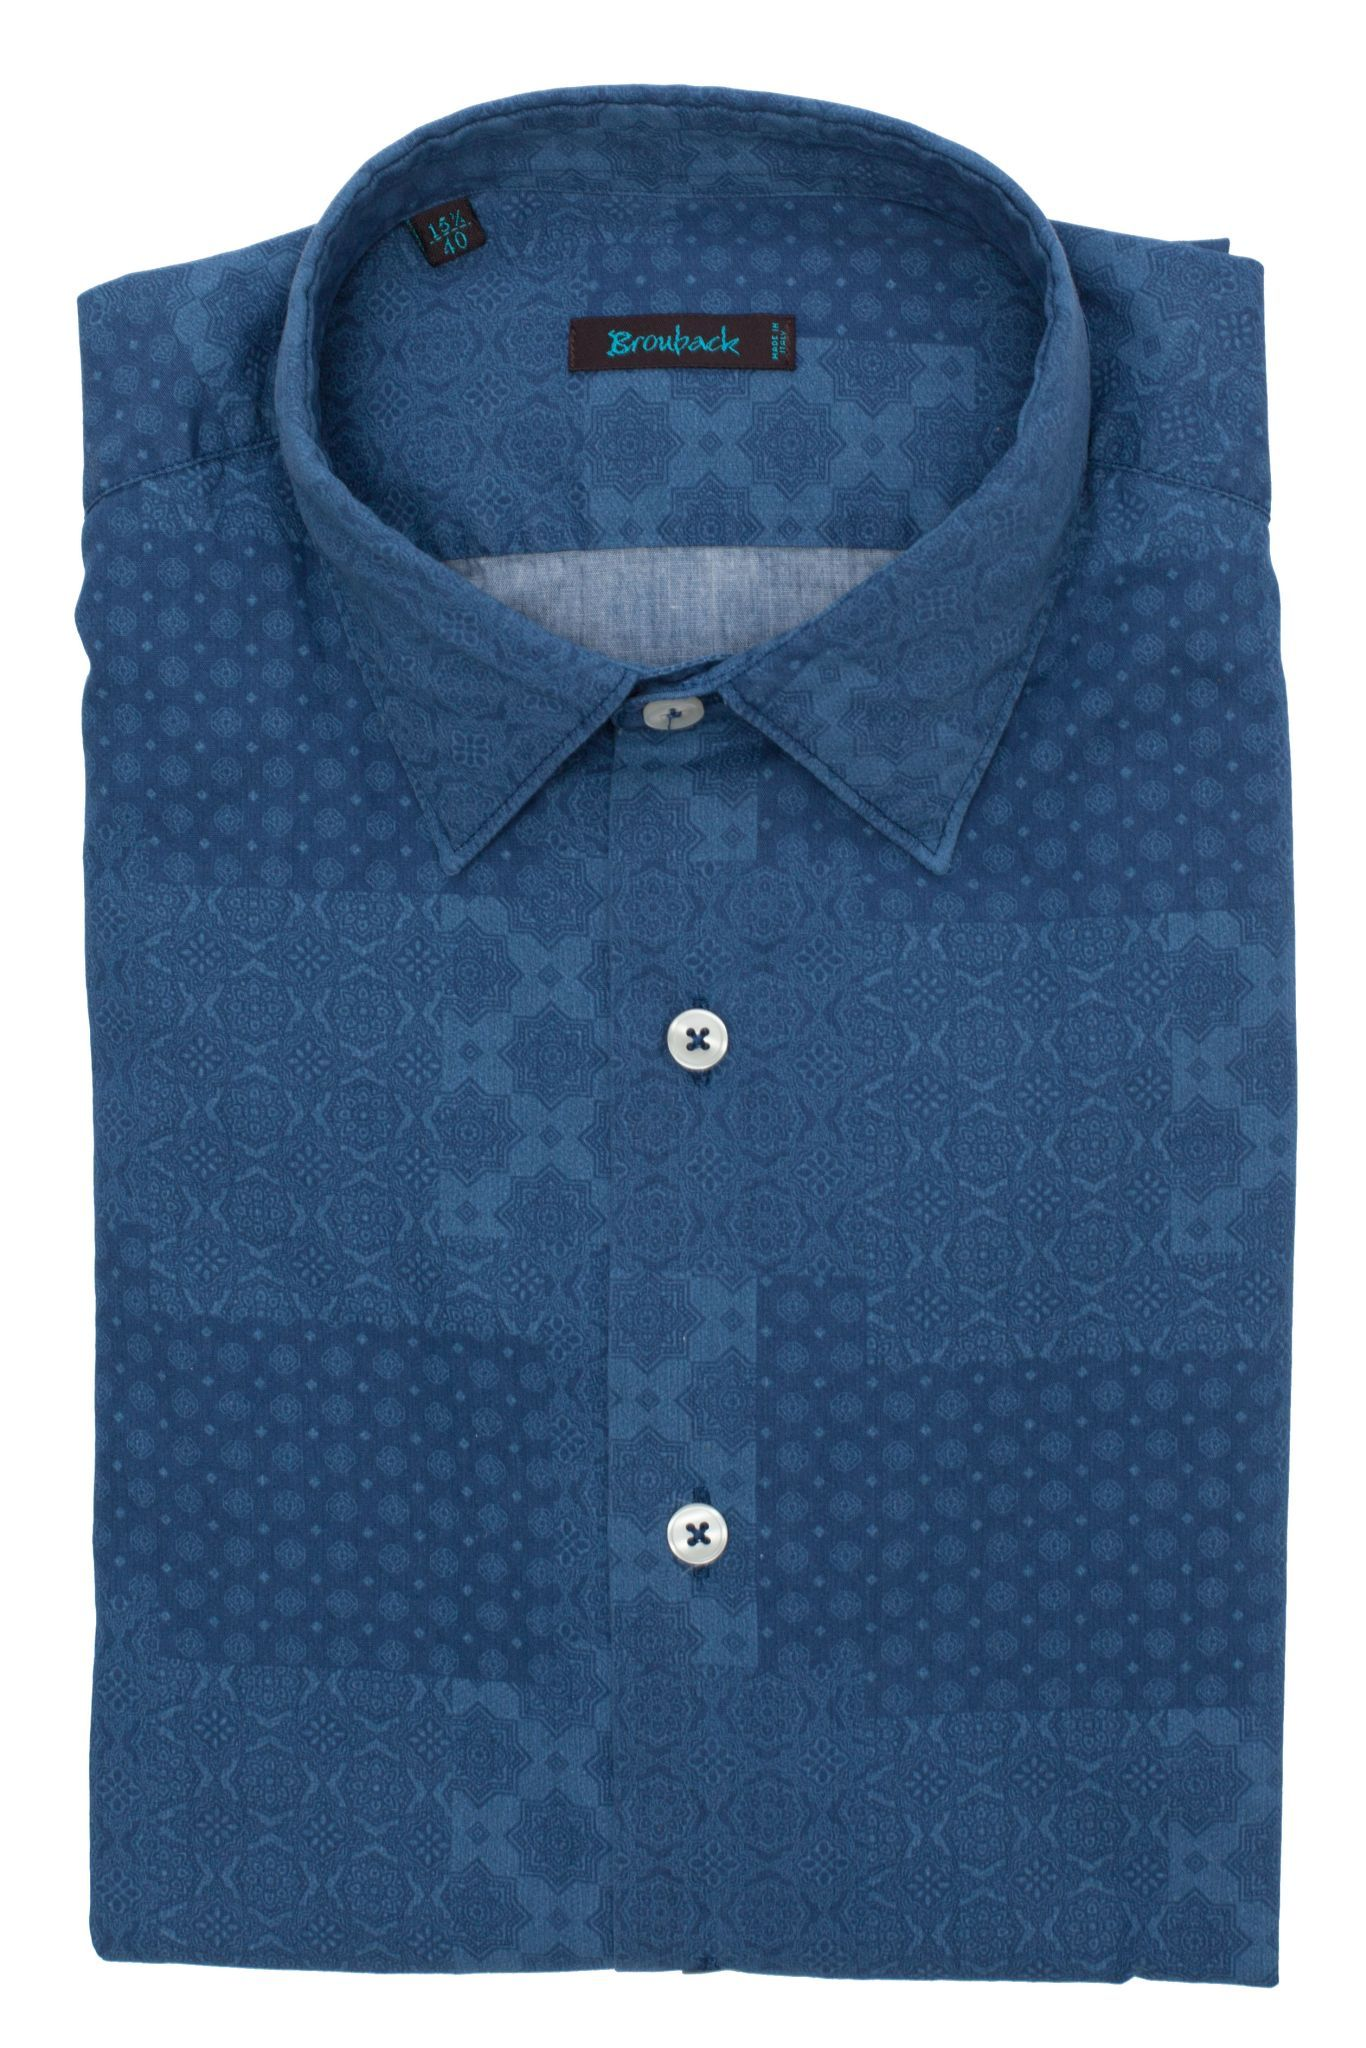 Синяя рубашка с геометрическими принтами